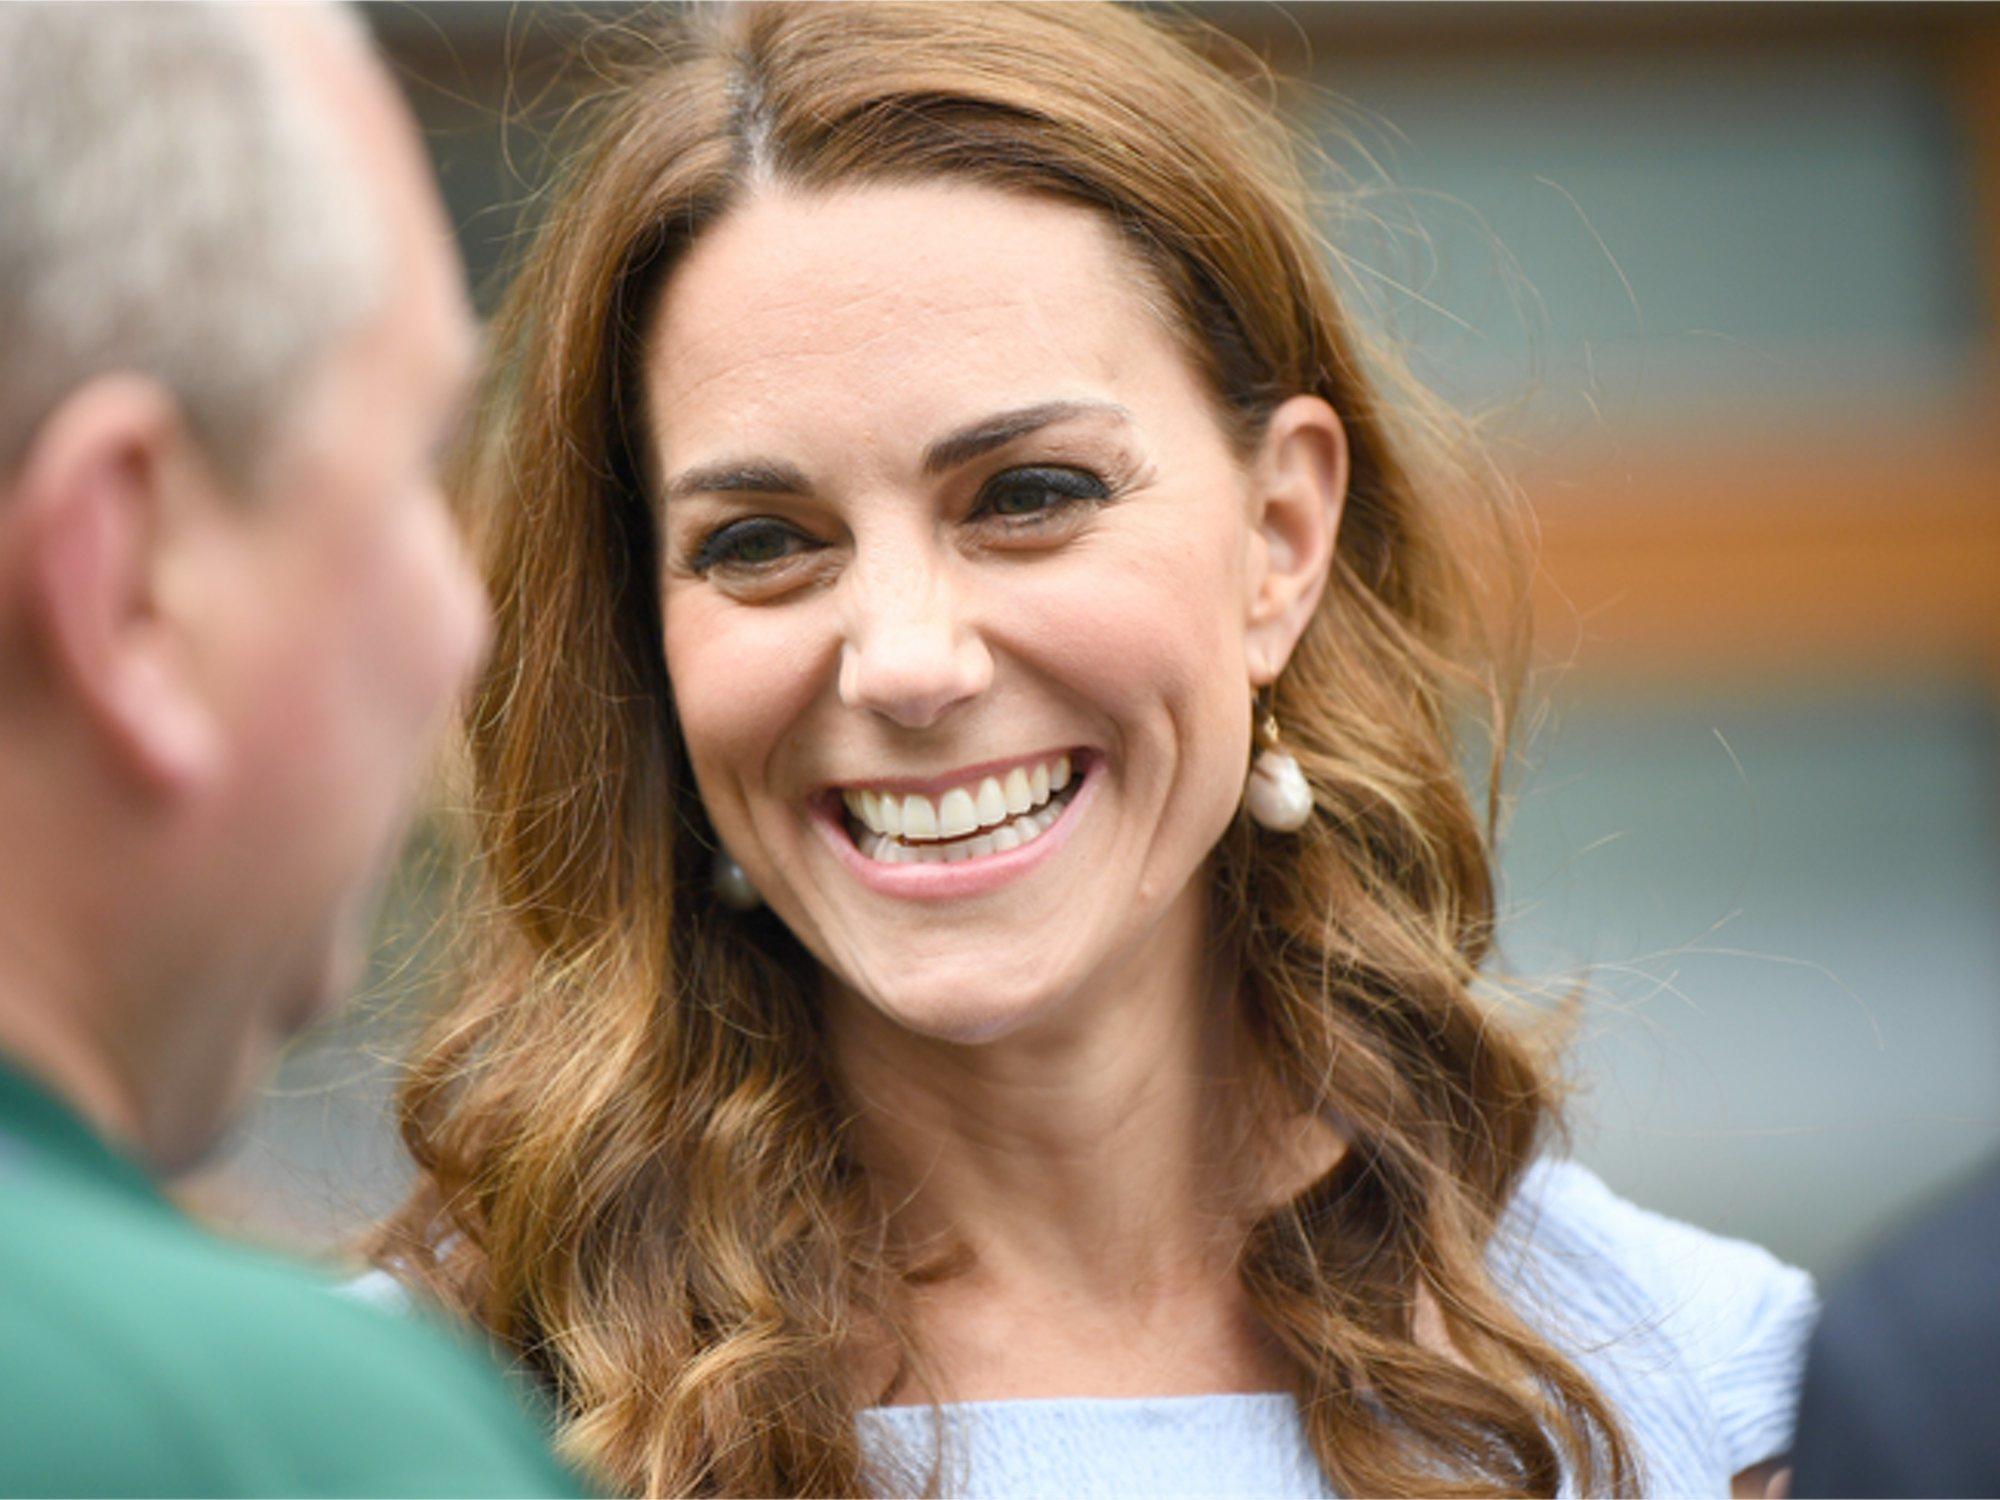 Acusan a Kate Middleton de haberse inyectado botox en la cara